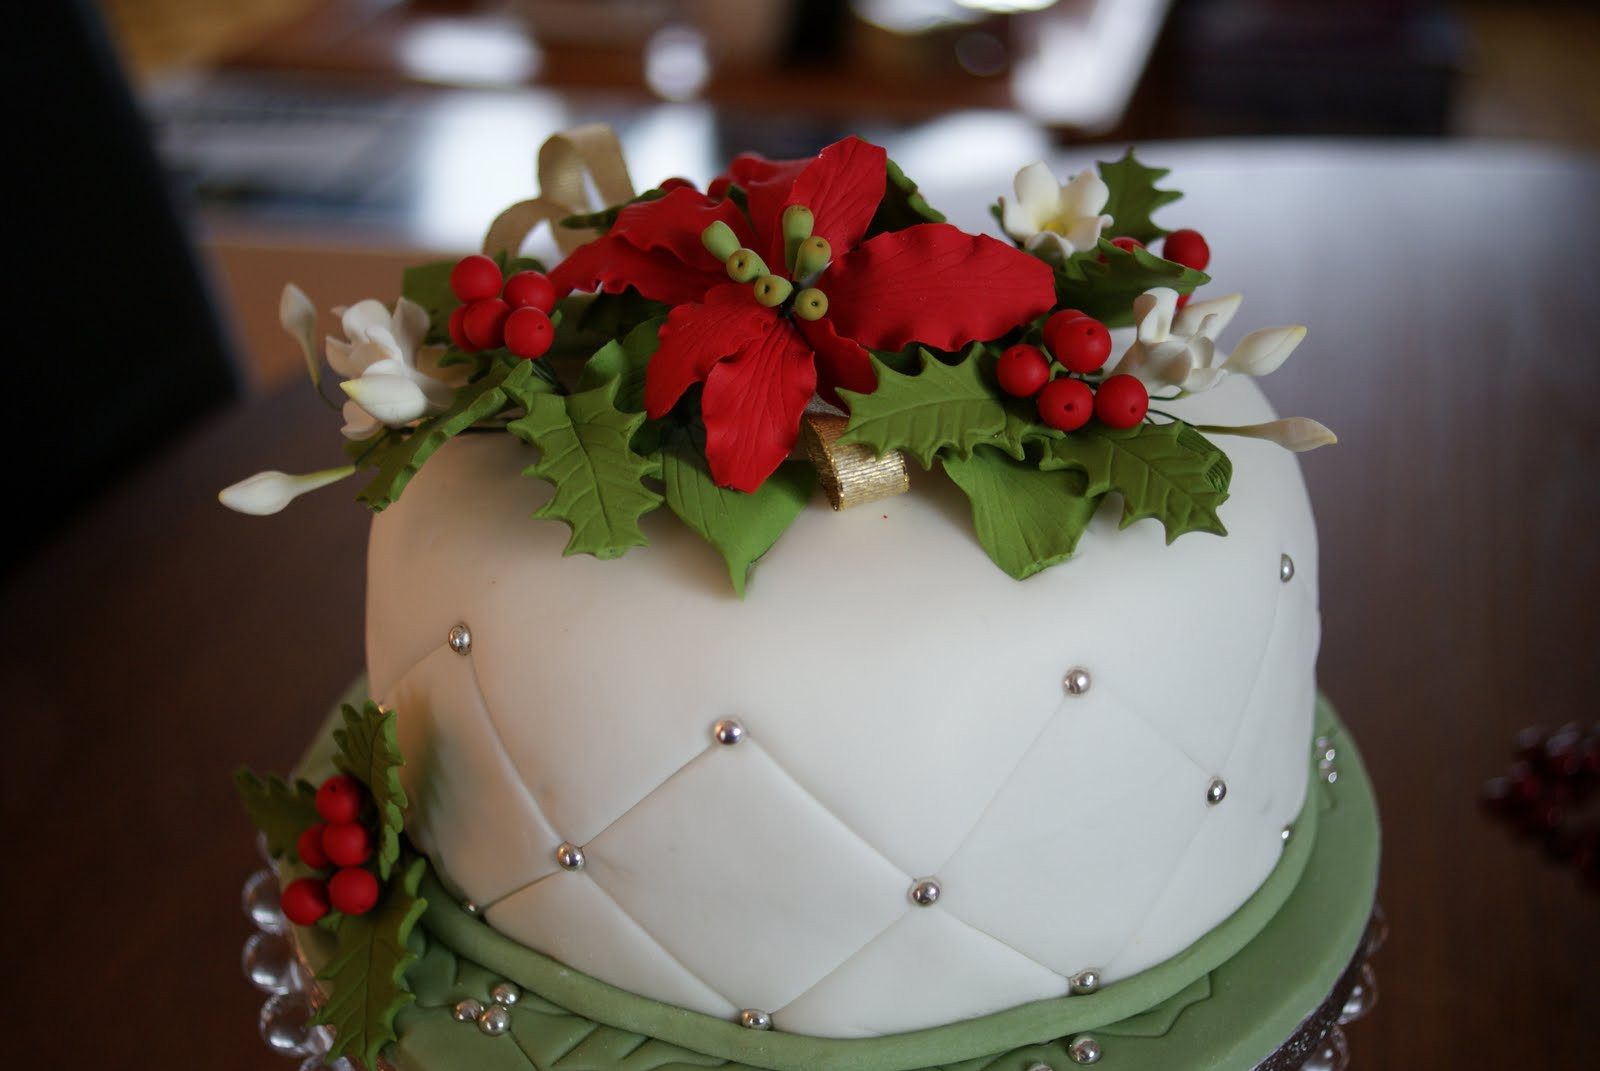 Cakes For Christmas  Festivals christmas cakes ideas nightmare